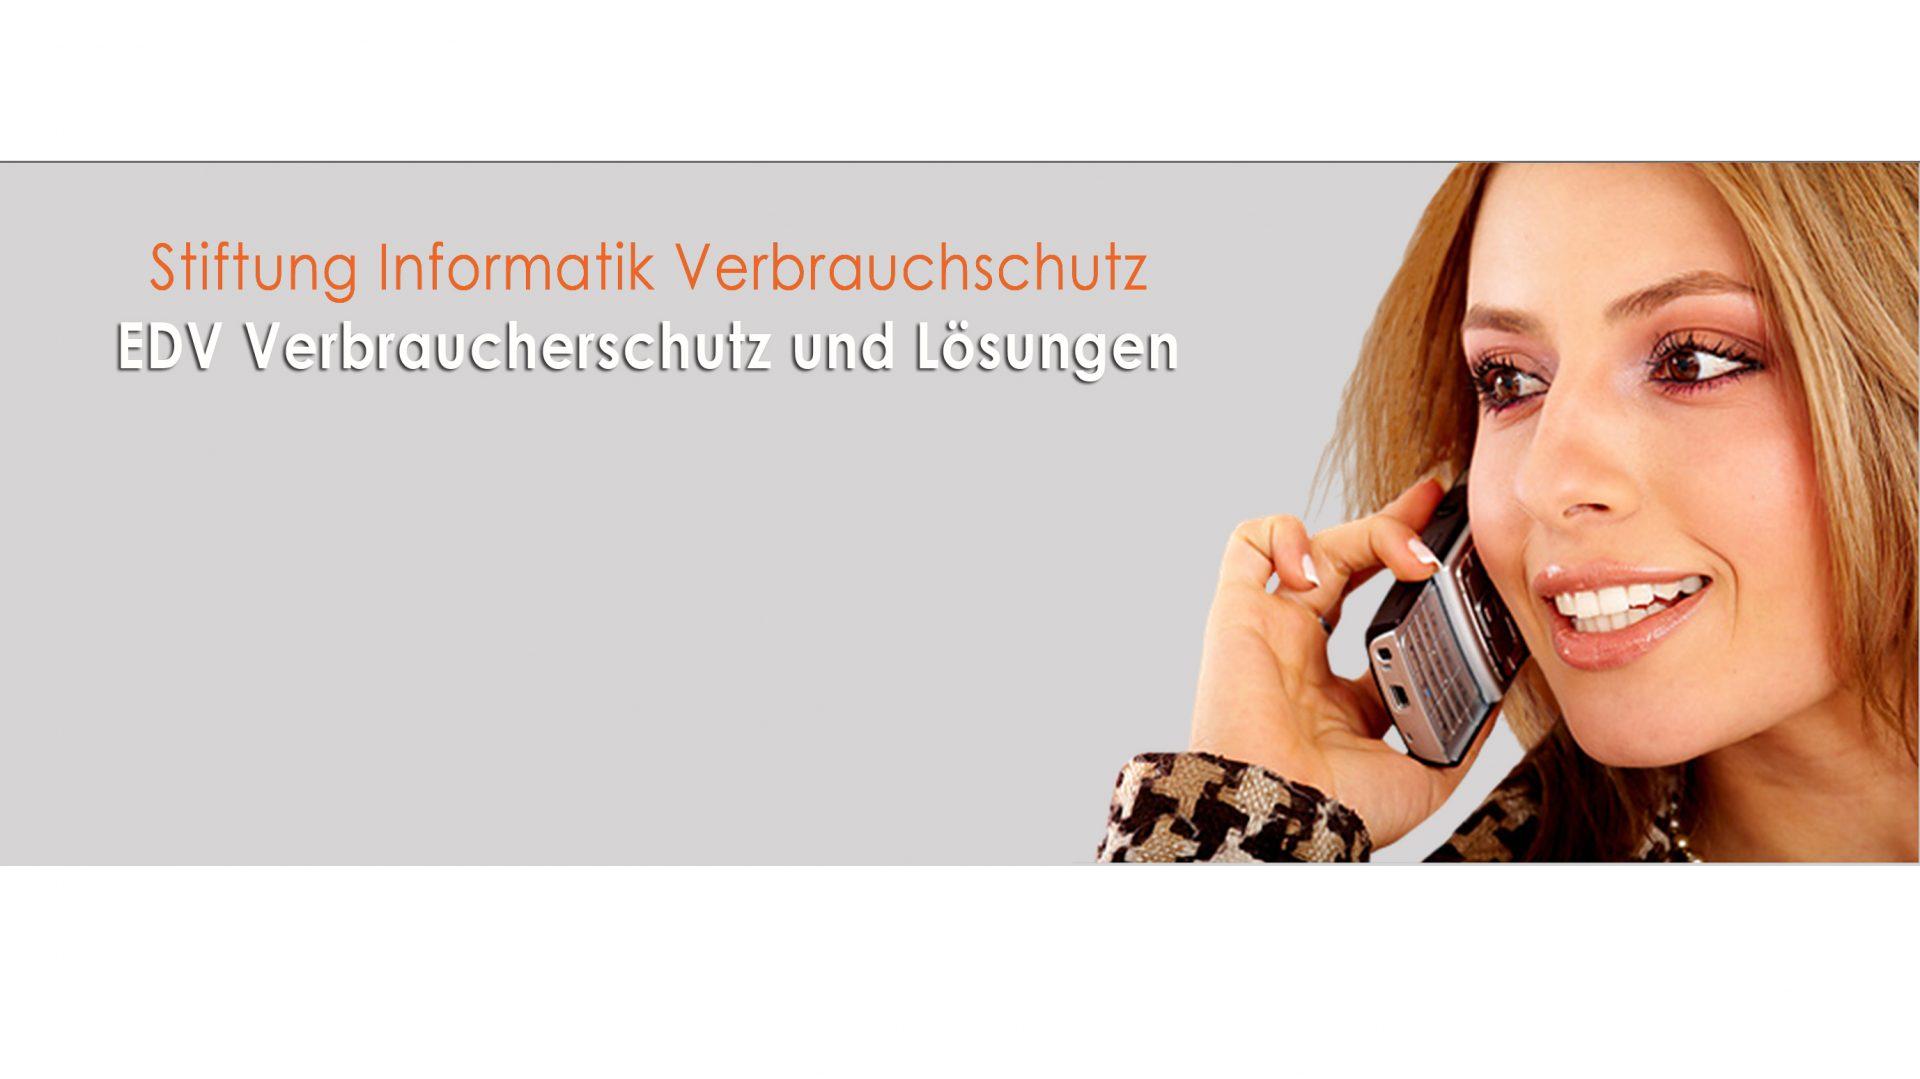 Stiftung Informatik Verbrauchschutz